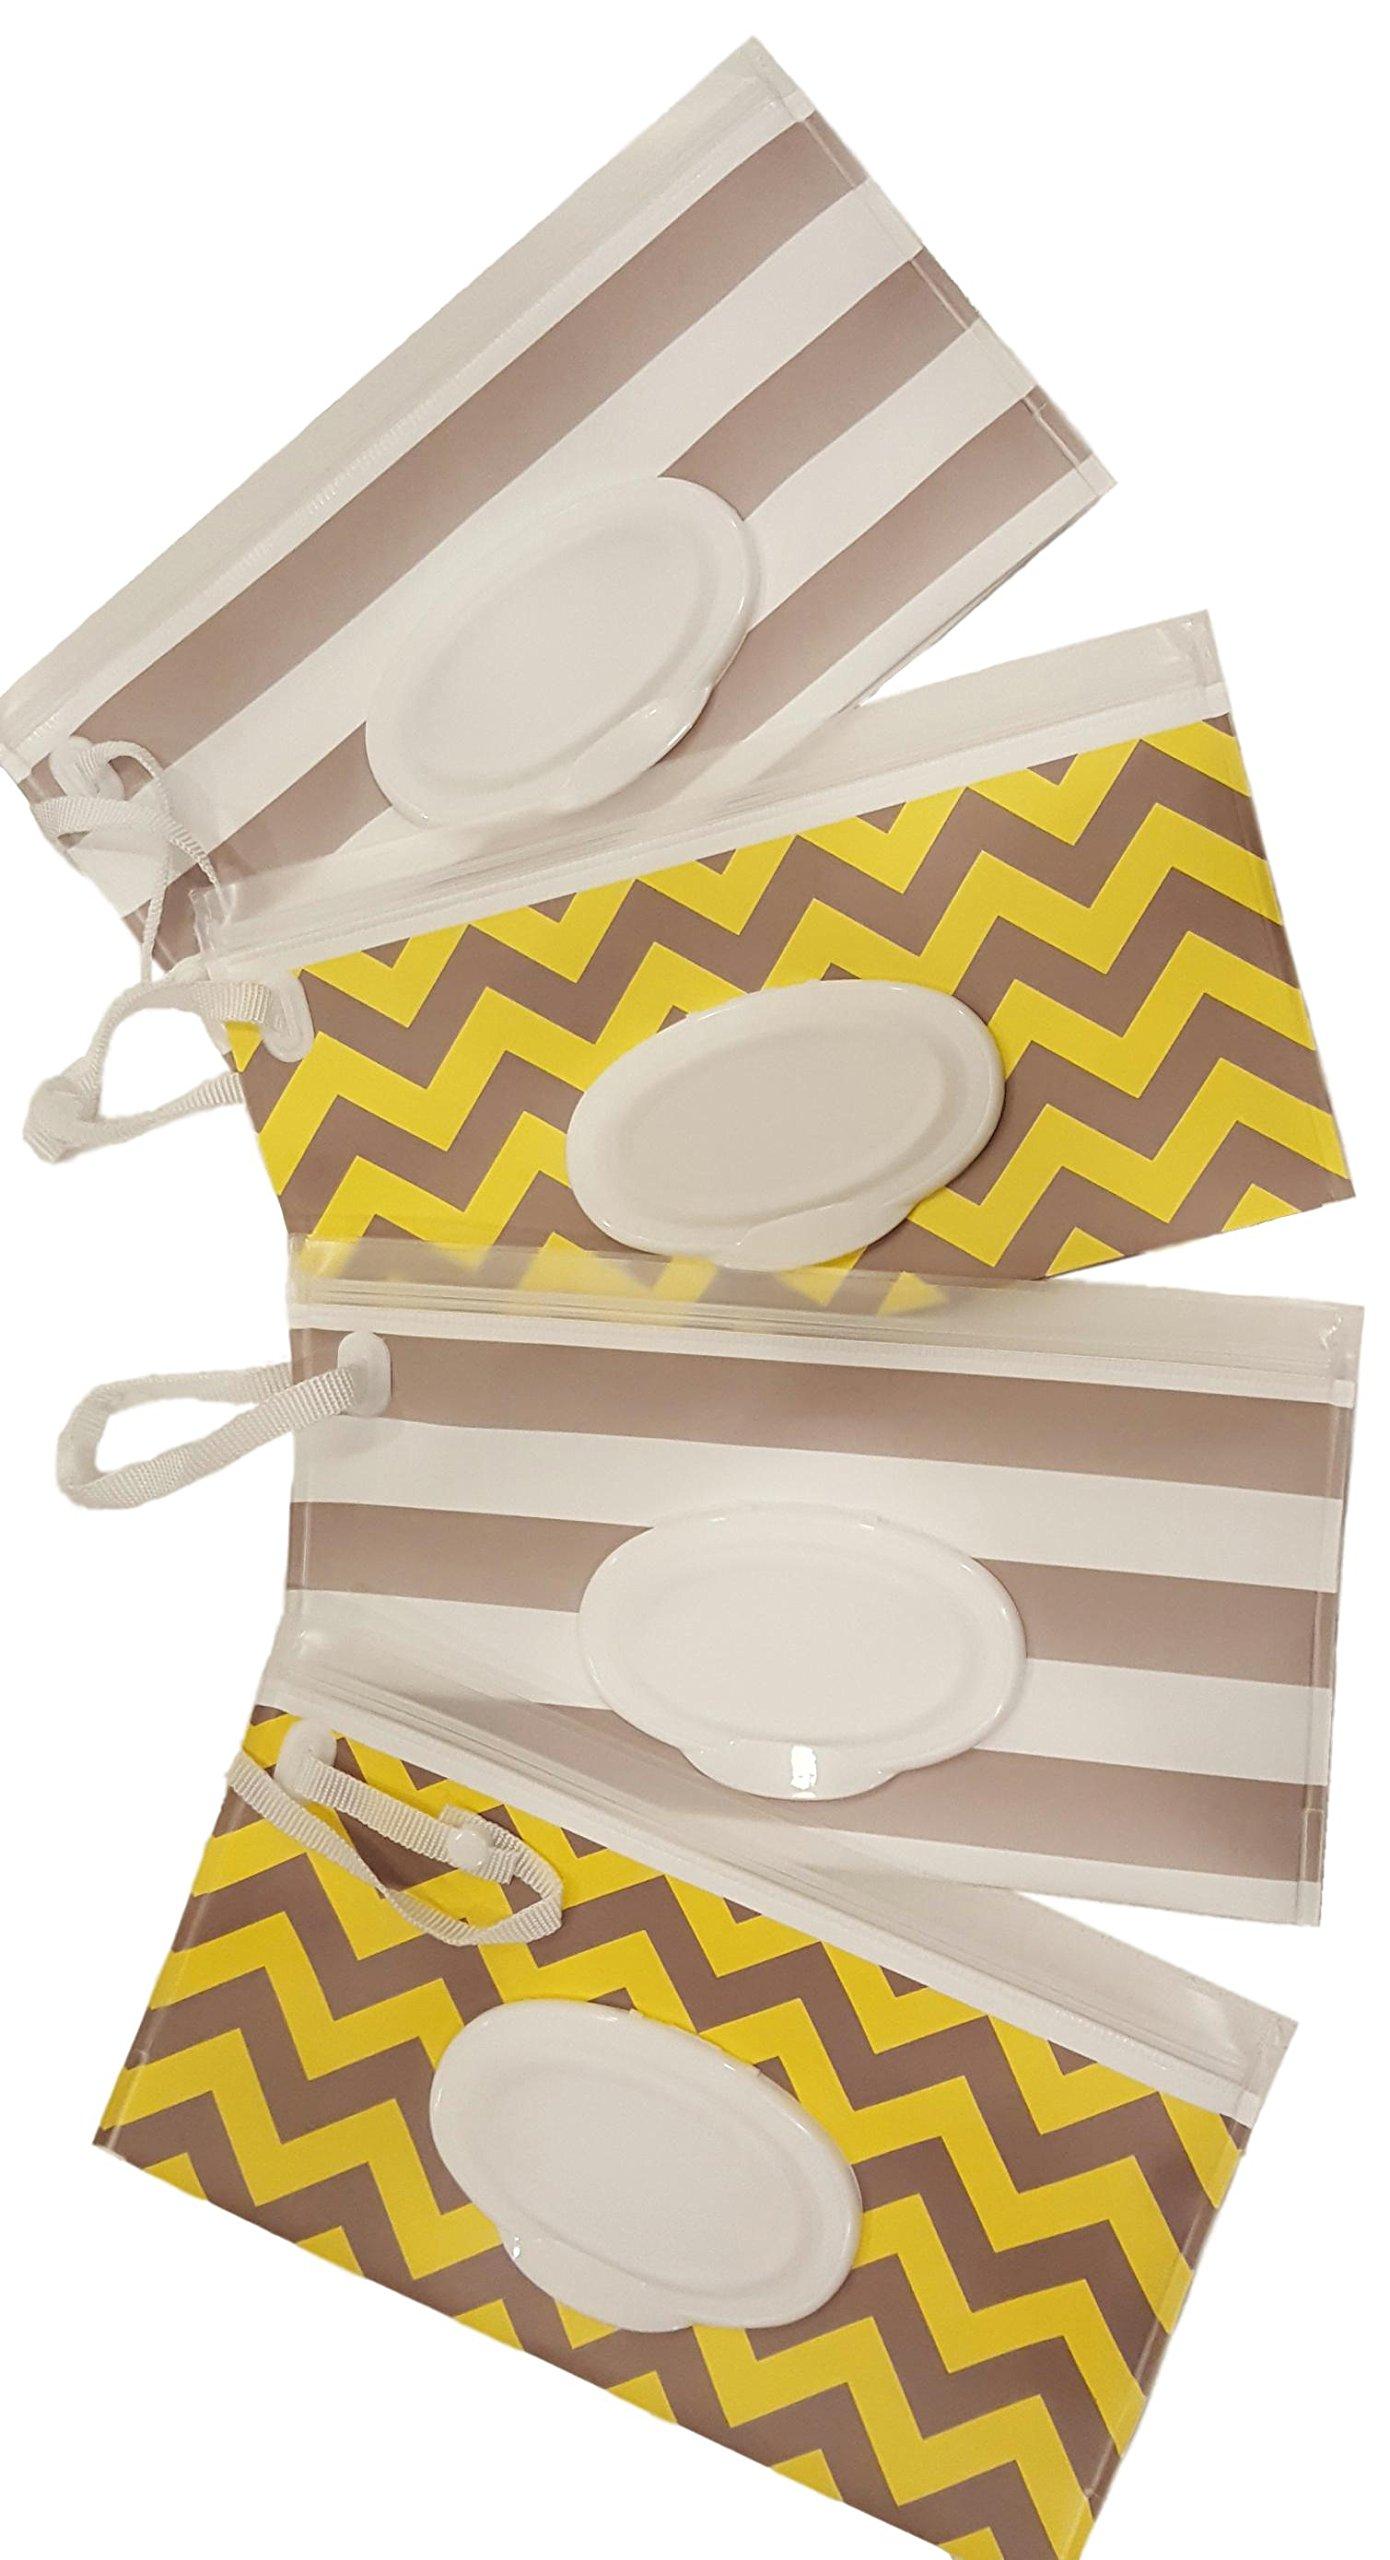 Little Stinker 4 Pack Baby Wipe Case Holder - Keeps Wipes Moist - Premium Wetwipe Cases - 2 White 2 Yellow by Little Stinker